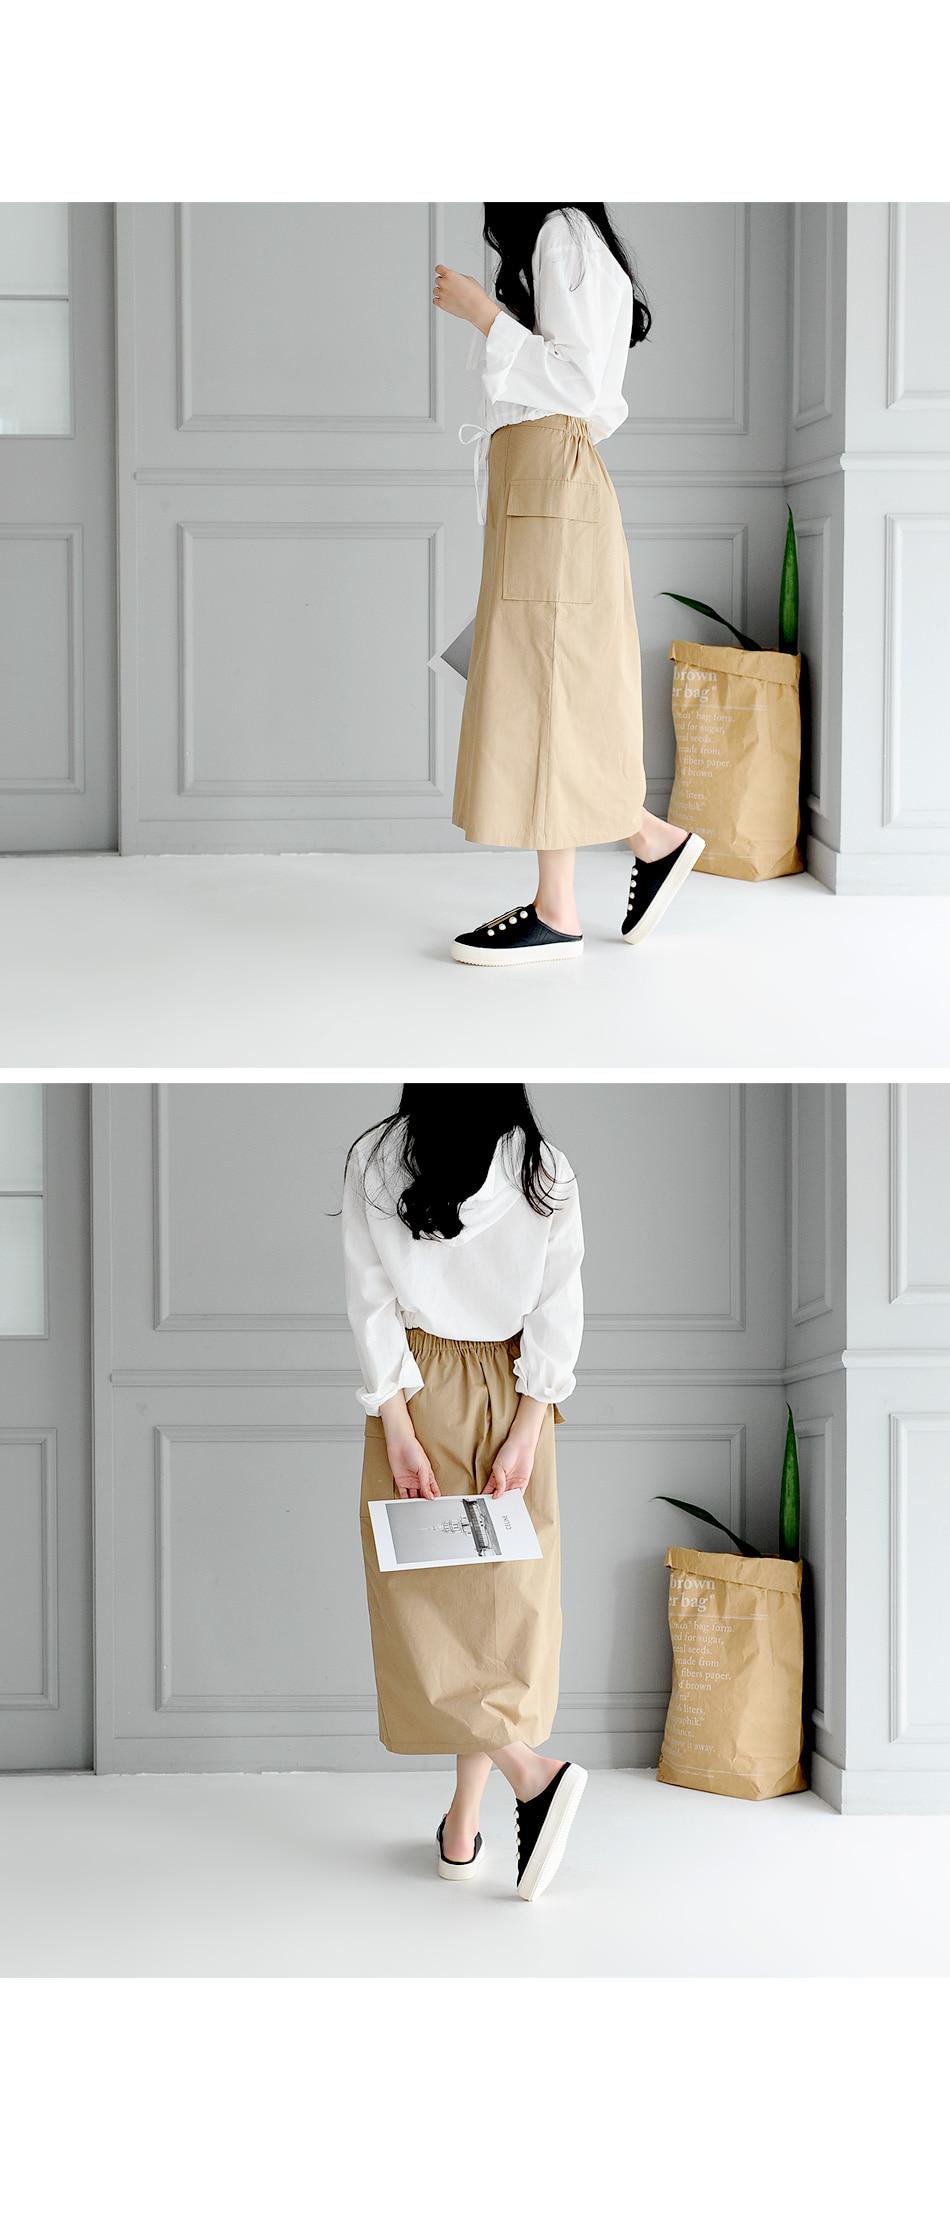 Mailen string hood